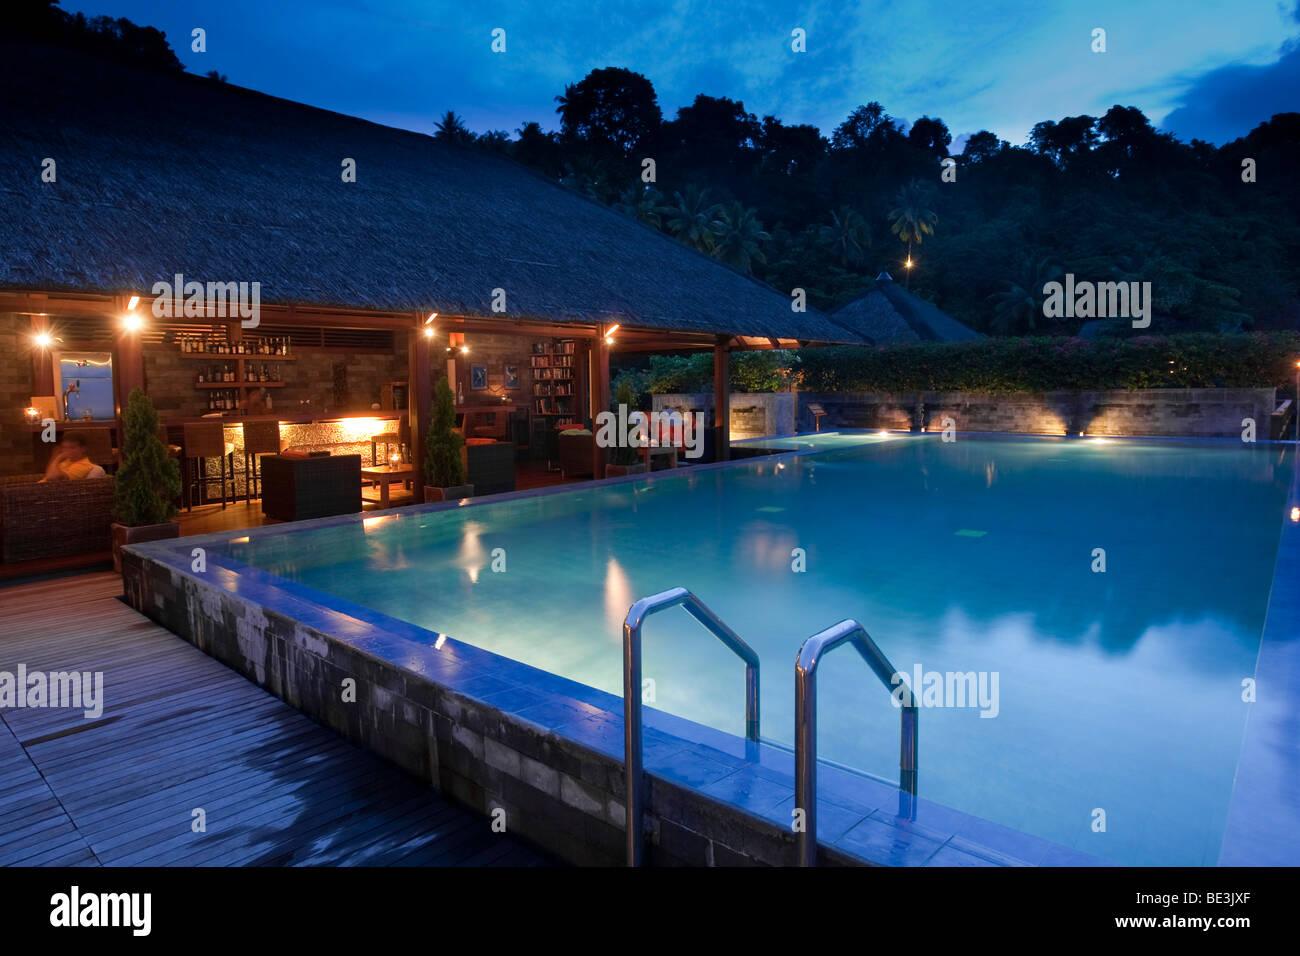 Hotel Minahasa Lagoon, swimming pool and bar, Sulawesi, Indonesia, Southeast Asia - Stock Image